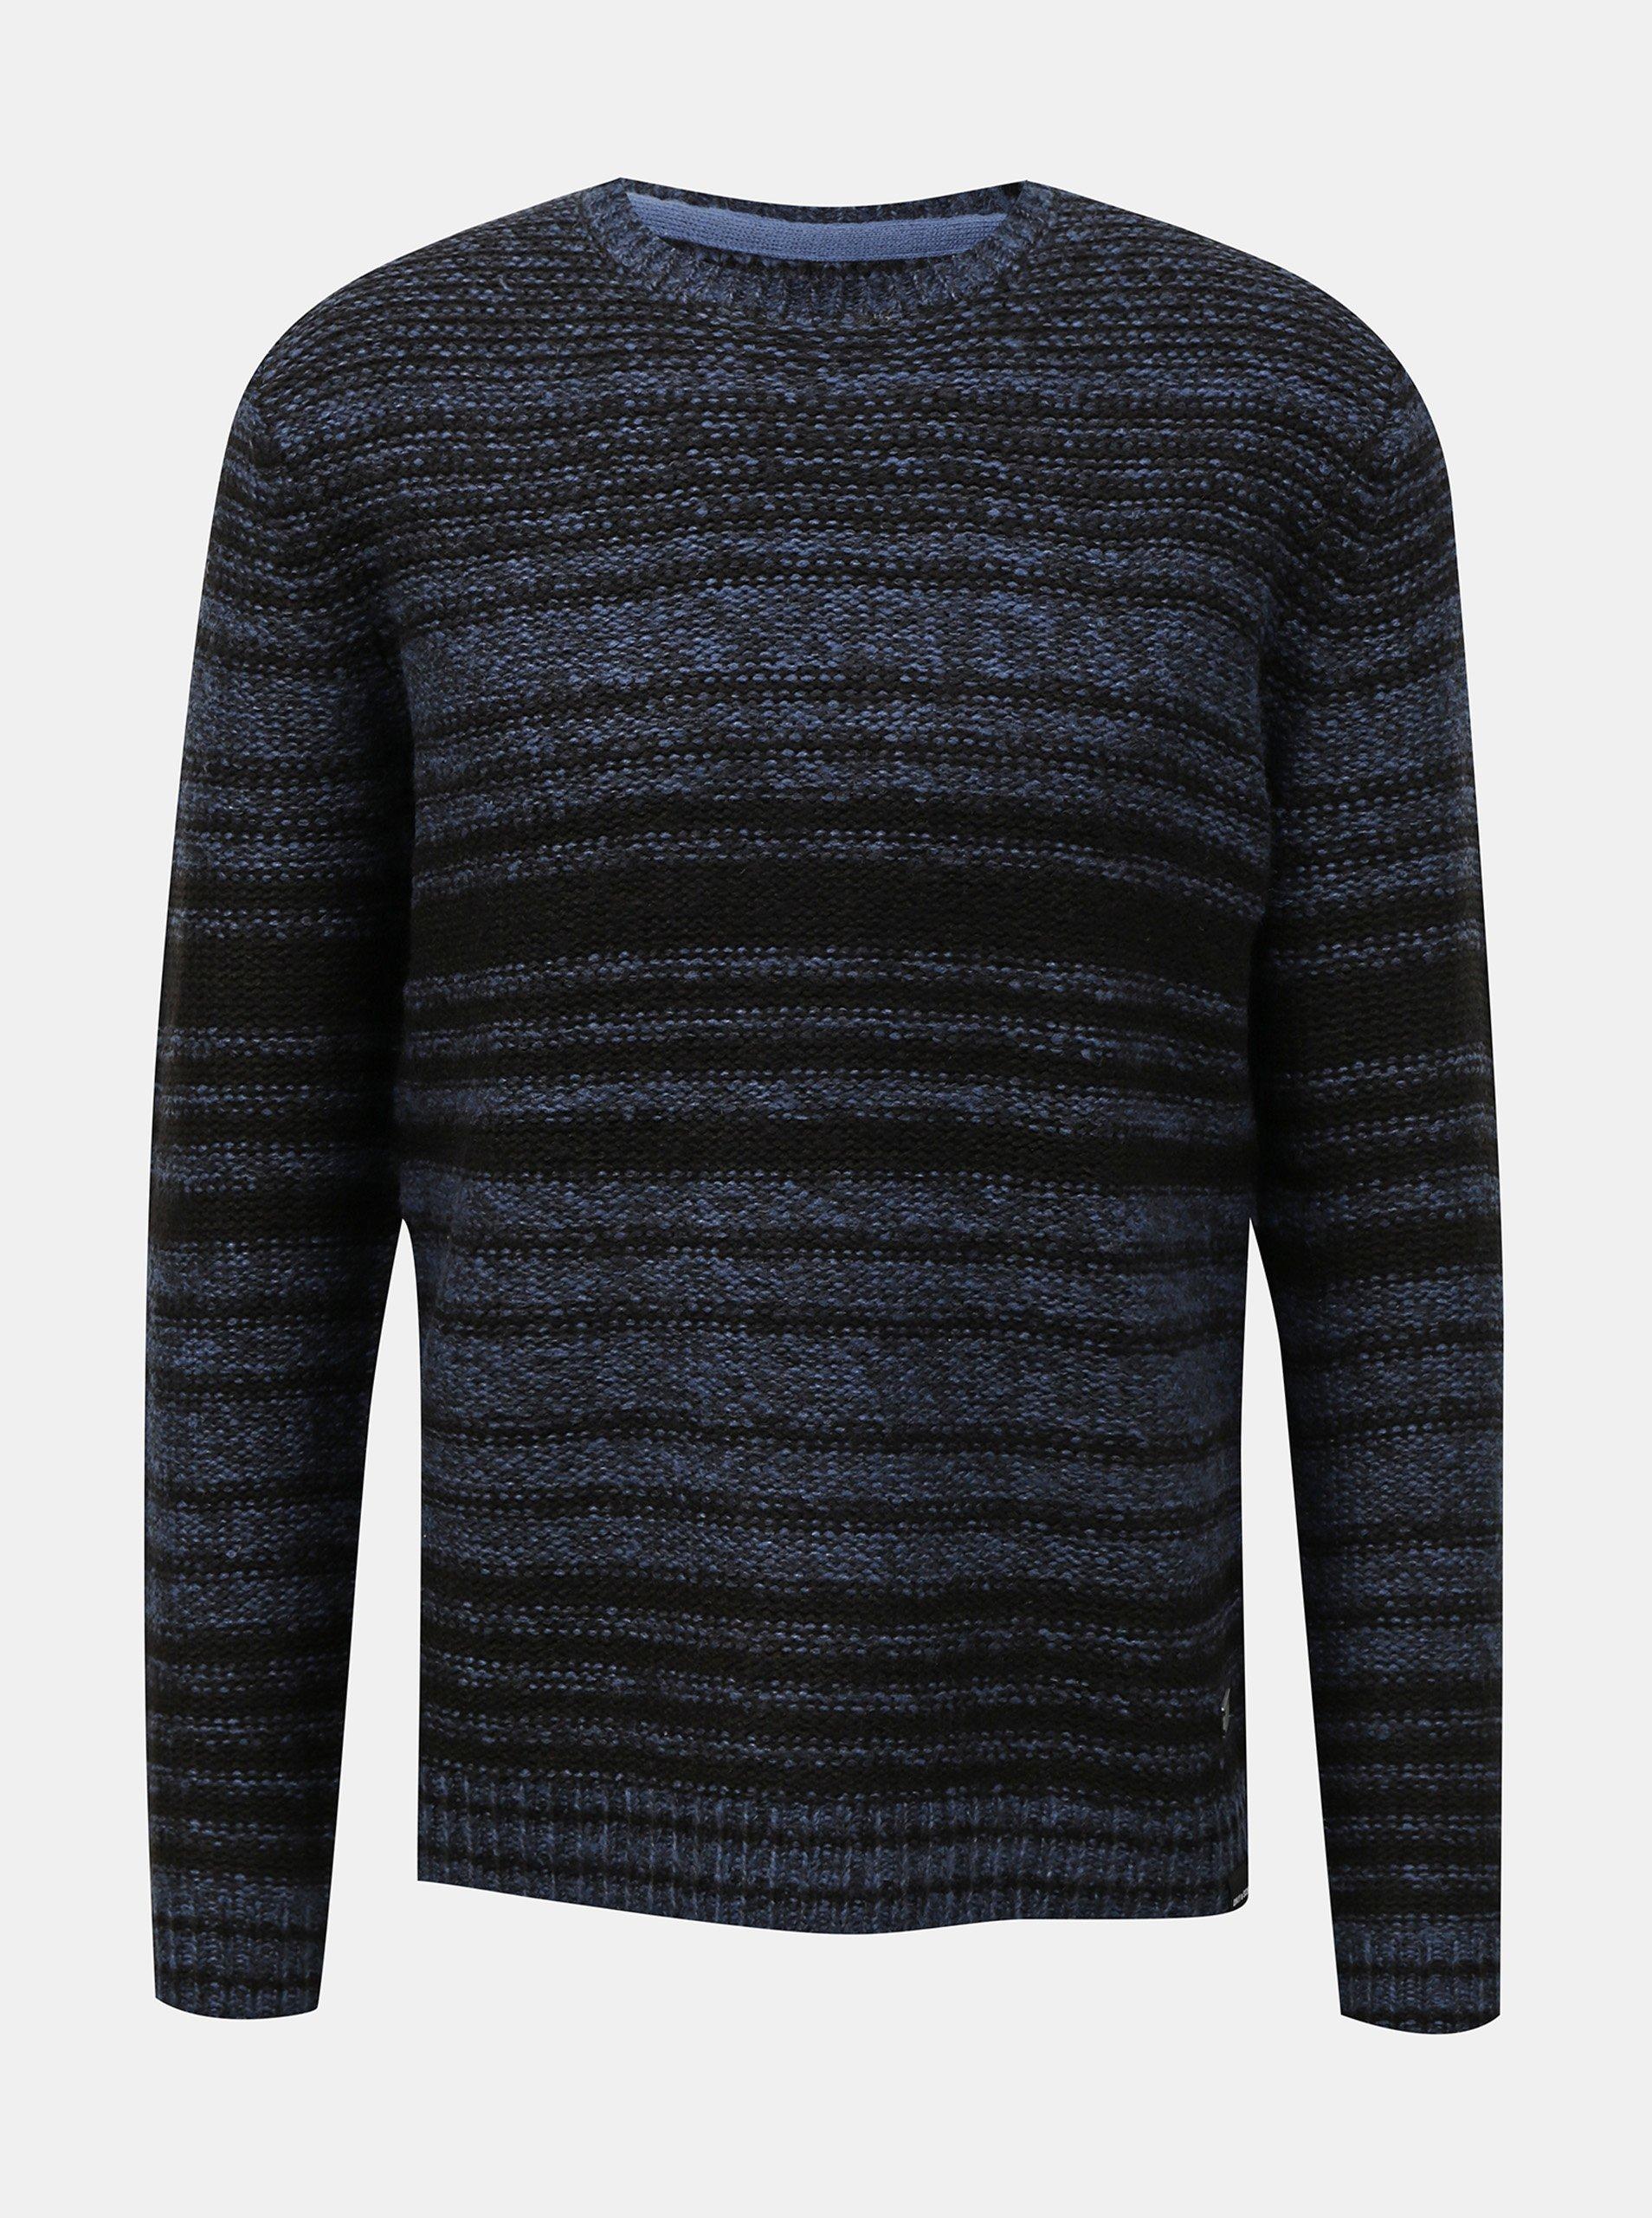 E-shop Modro-černý pruhovaný svetr ONLY & SONS Callen